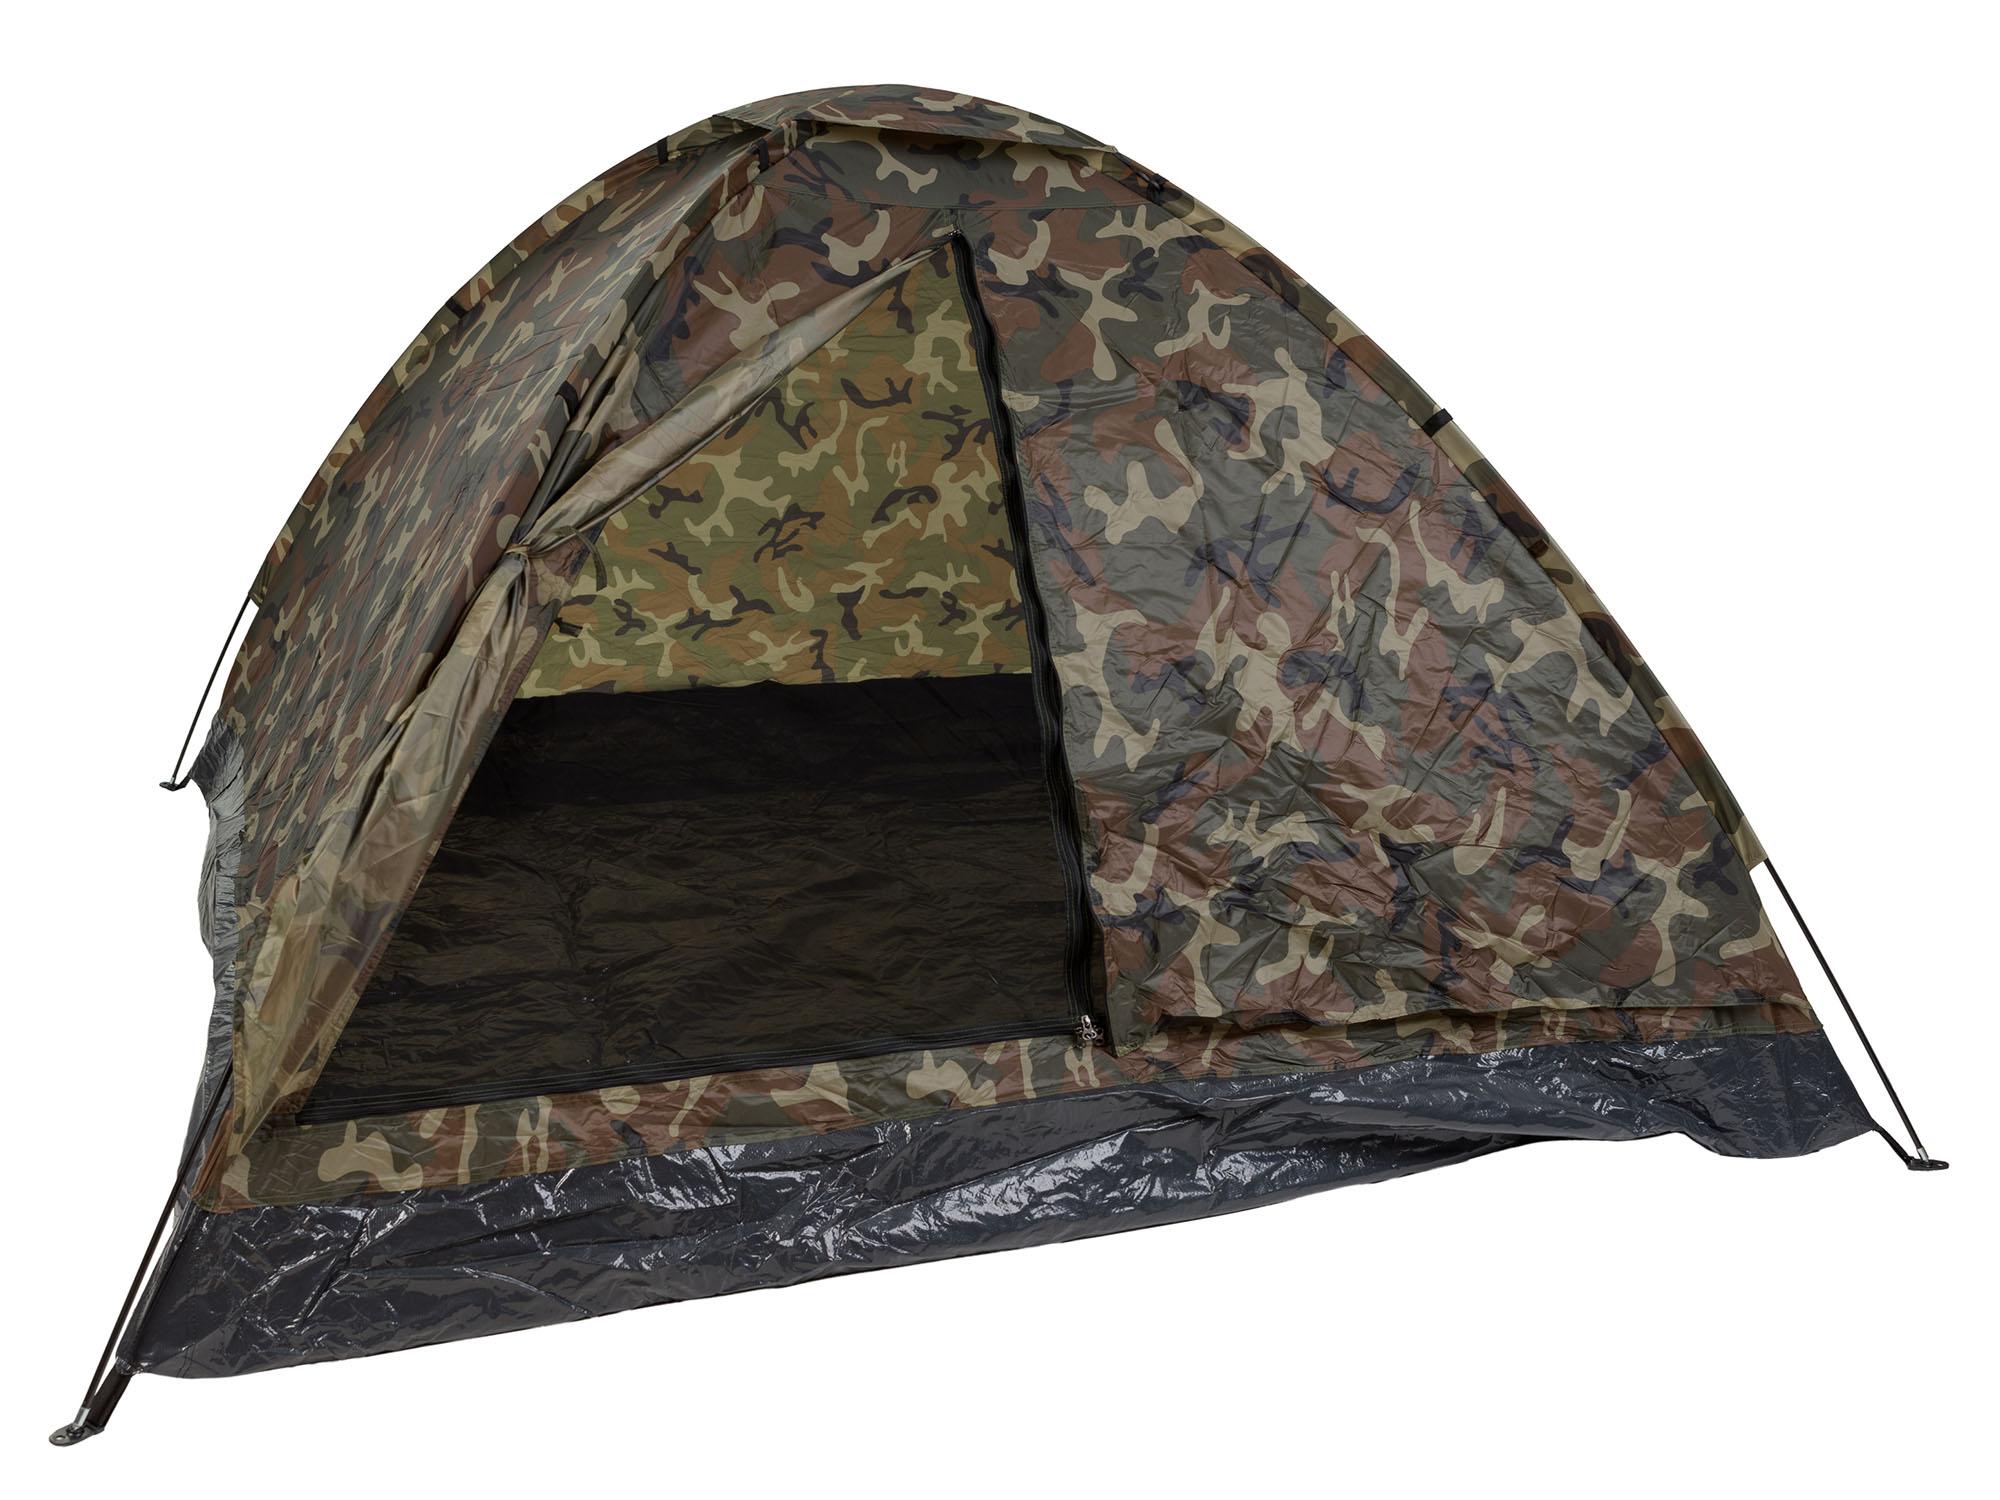 Vojenský STAN IGLO 3-posteľová izba - LESNÁ Kamufláž